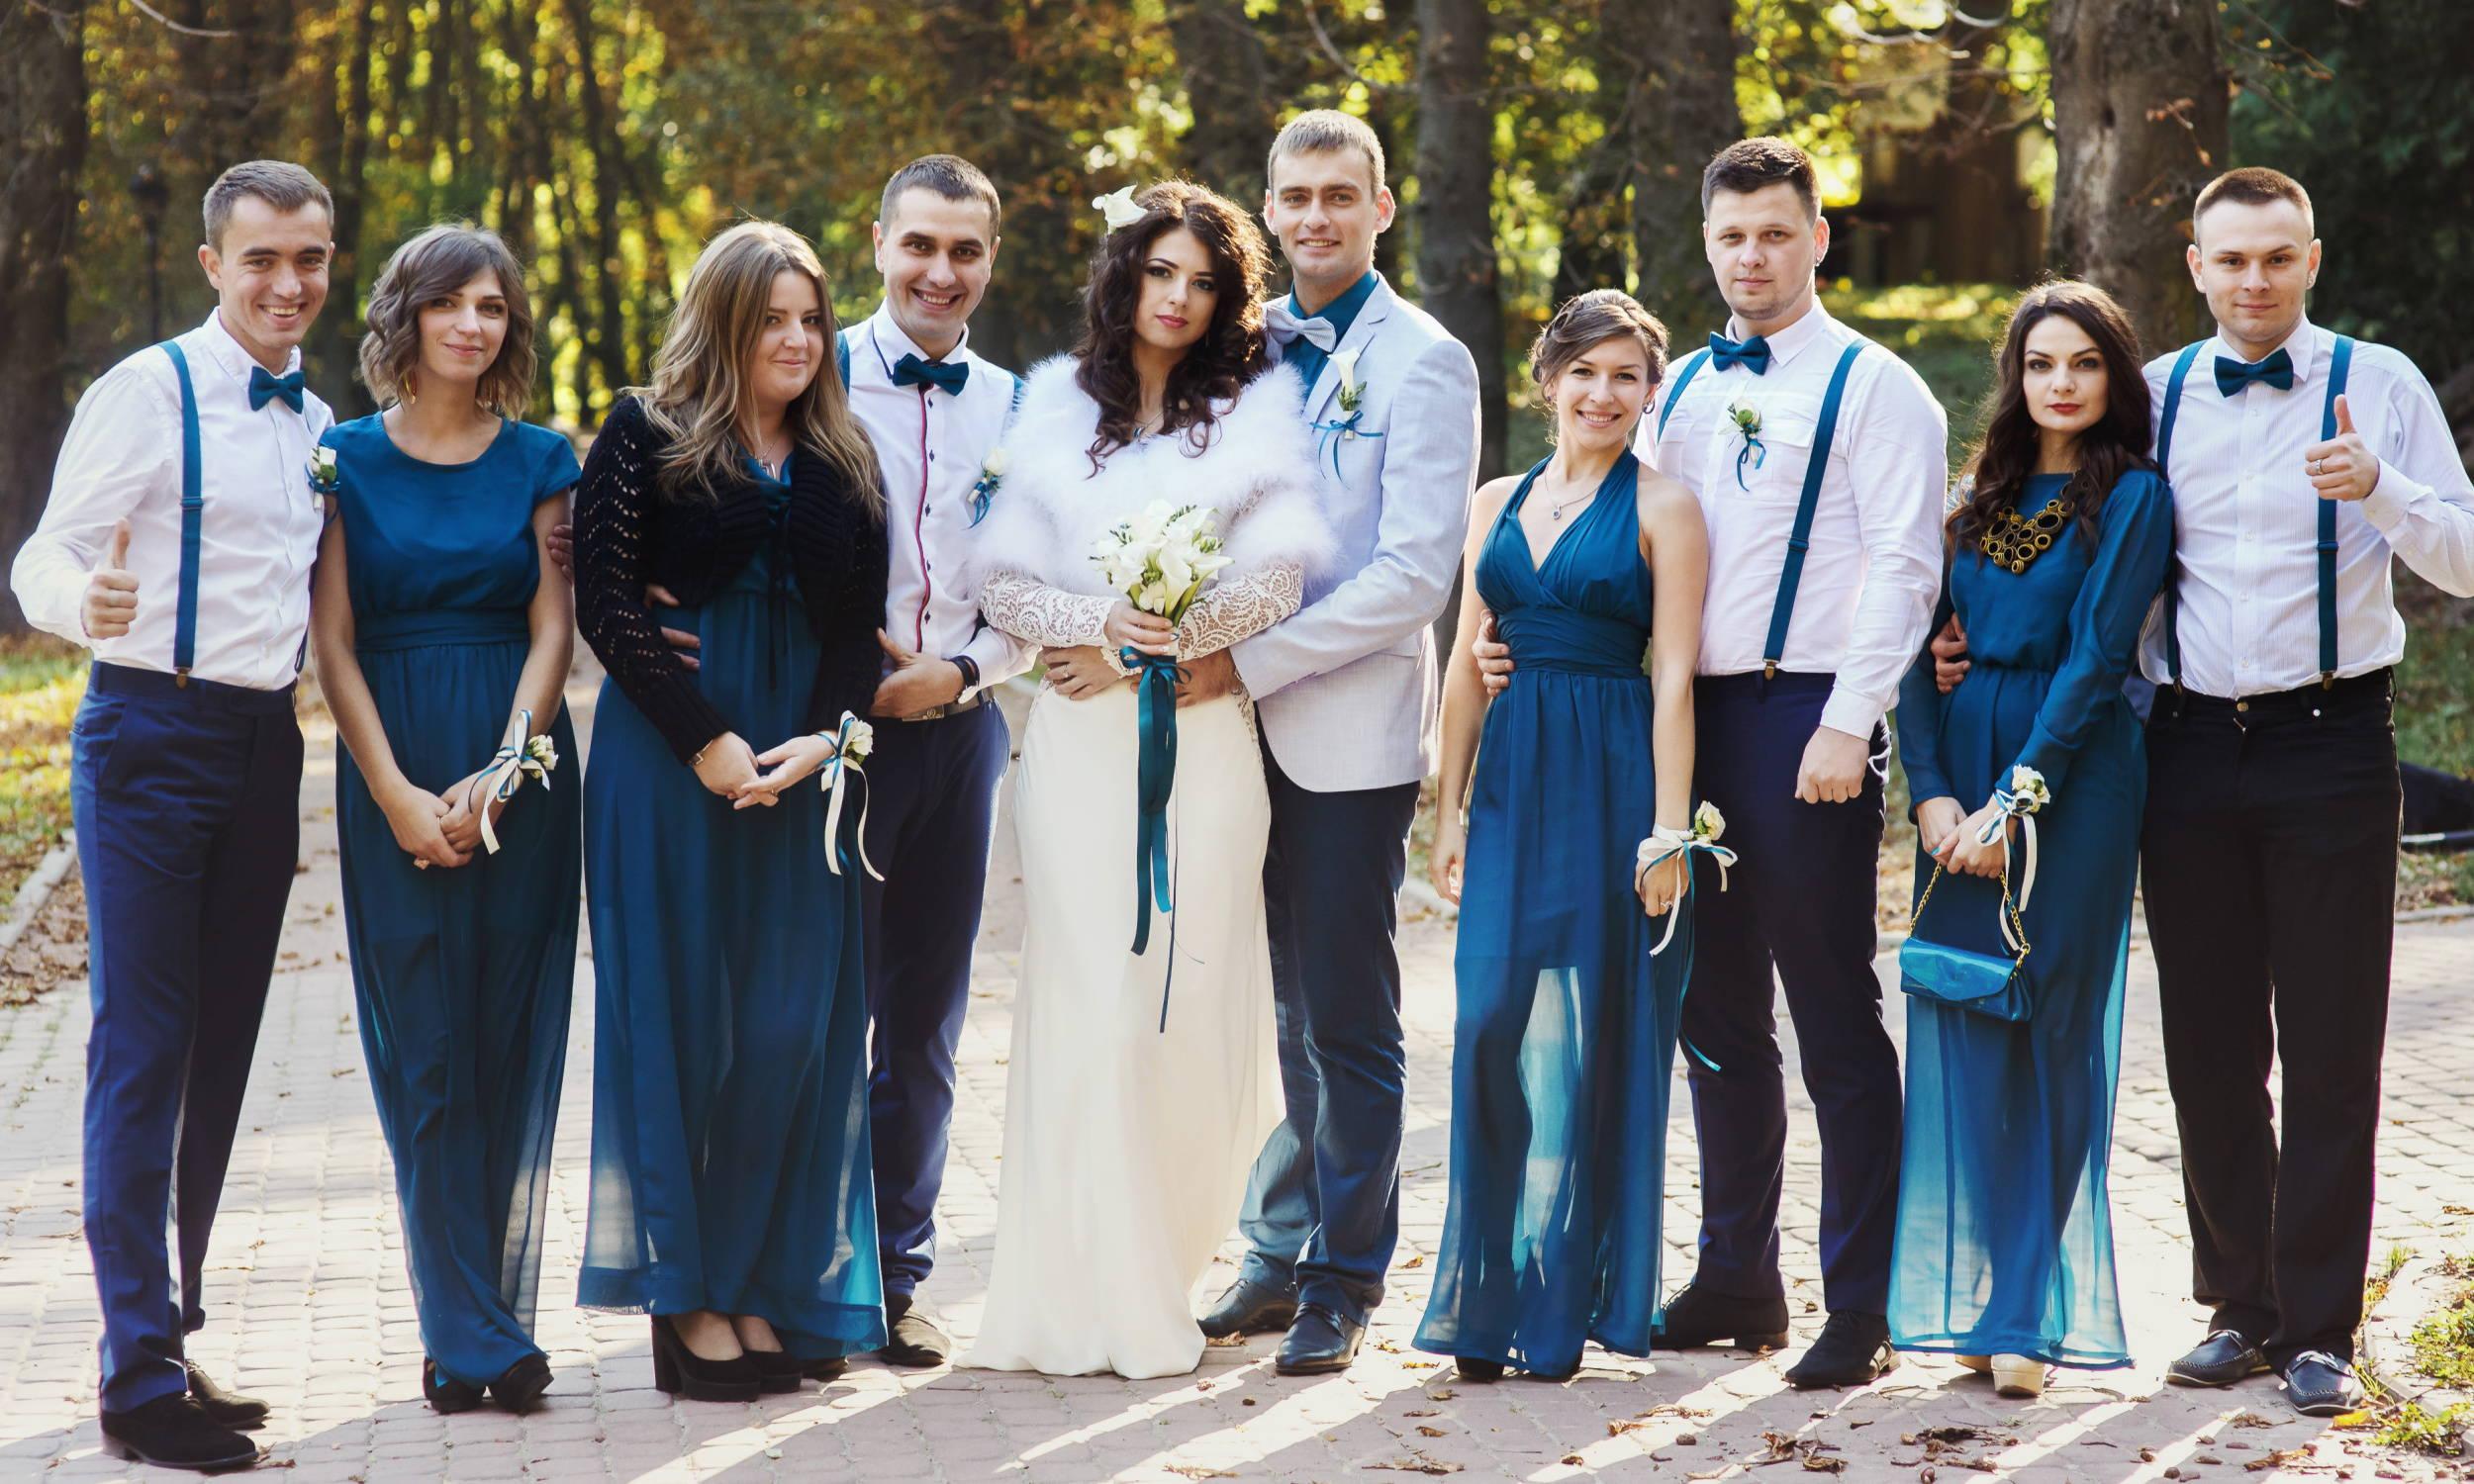 Wedding Suspenders - Wedding Party Wearing Navy Bow Tie & Navy Suspenders